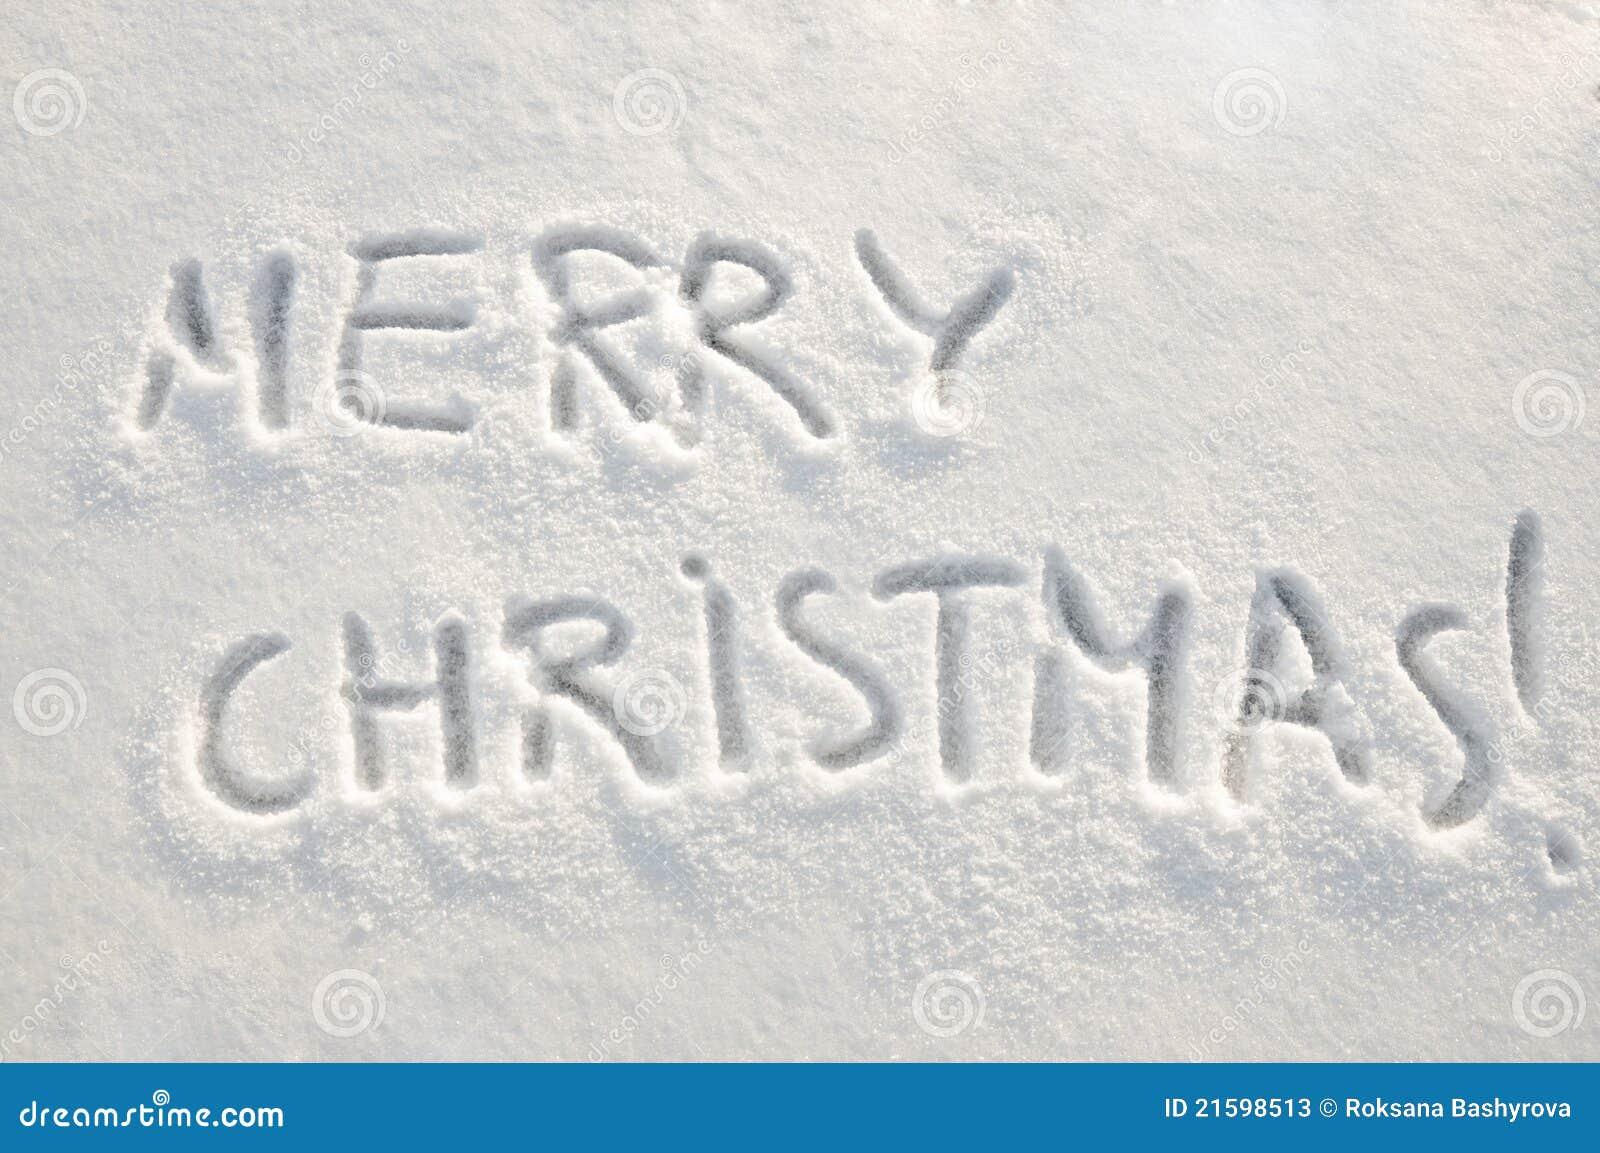 Merry Christmas Text On Snow Stock Photos - Image: 21598513